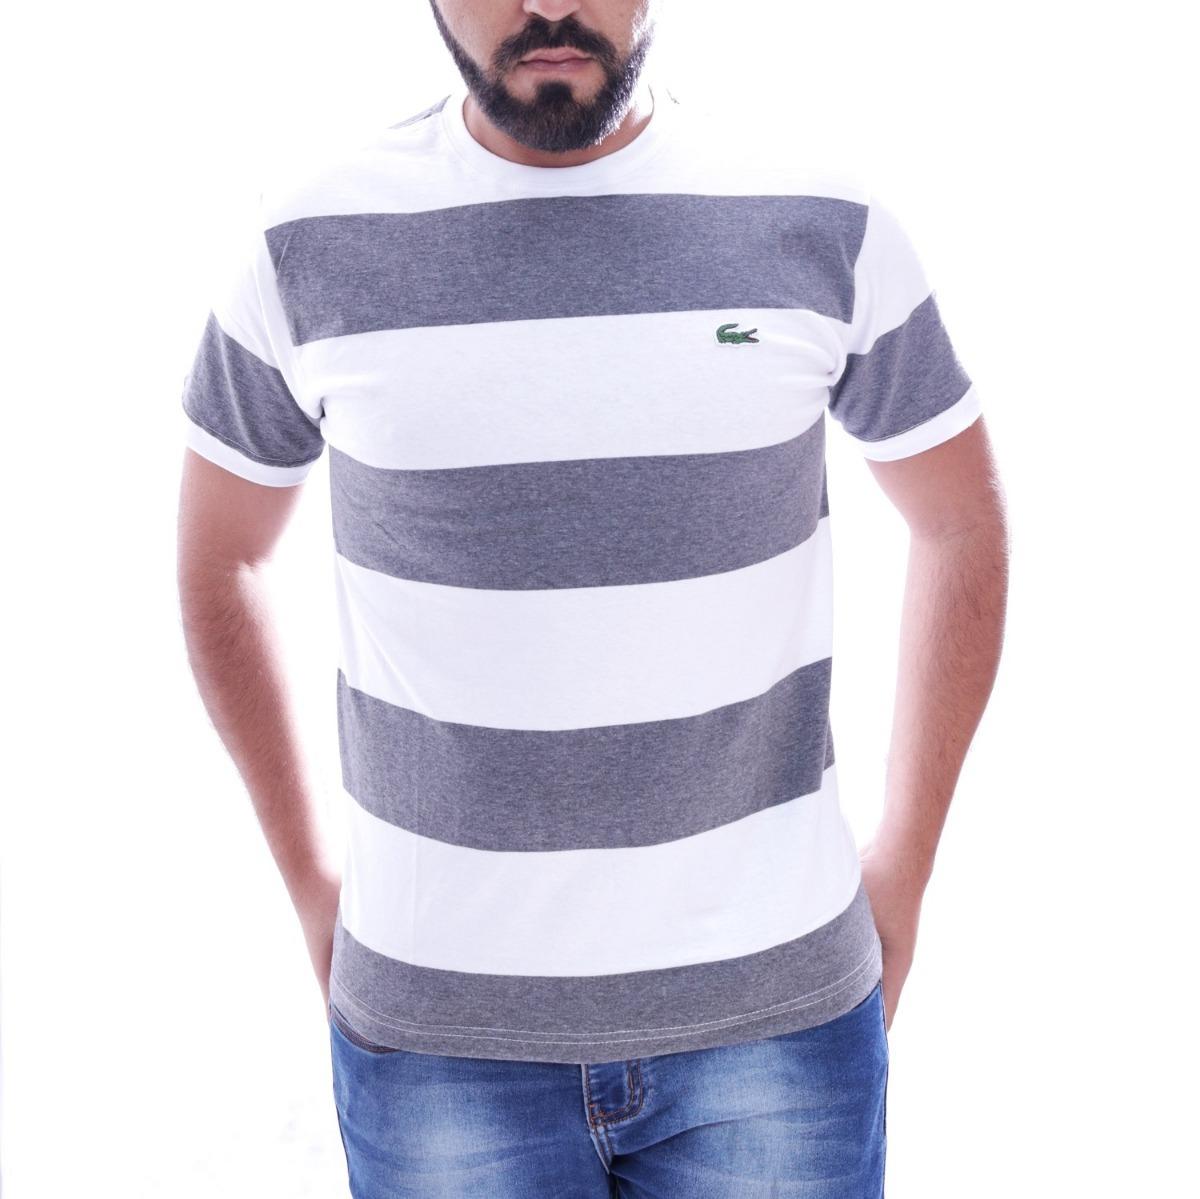 c173c328bce5a Camisa Camiseta Lacoste Listrada Masc Branco Cinza Original - R  89 ...